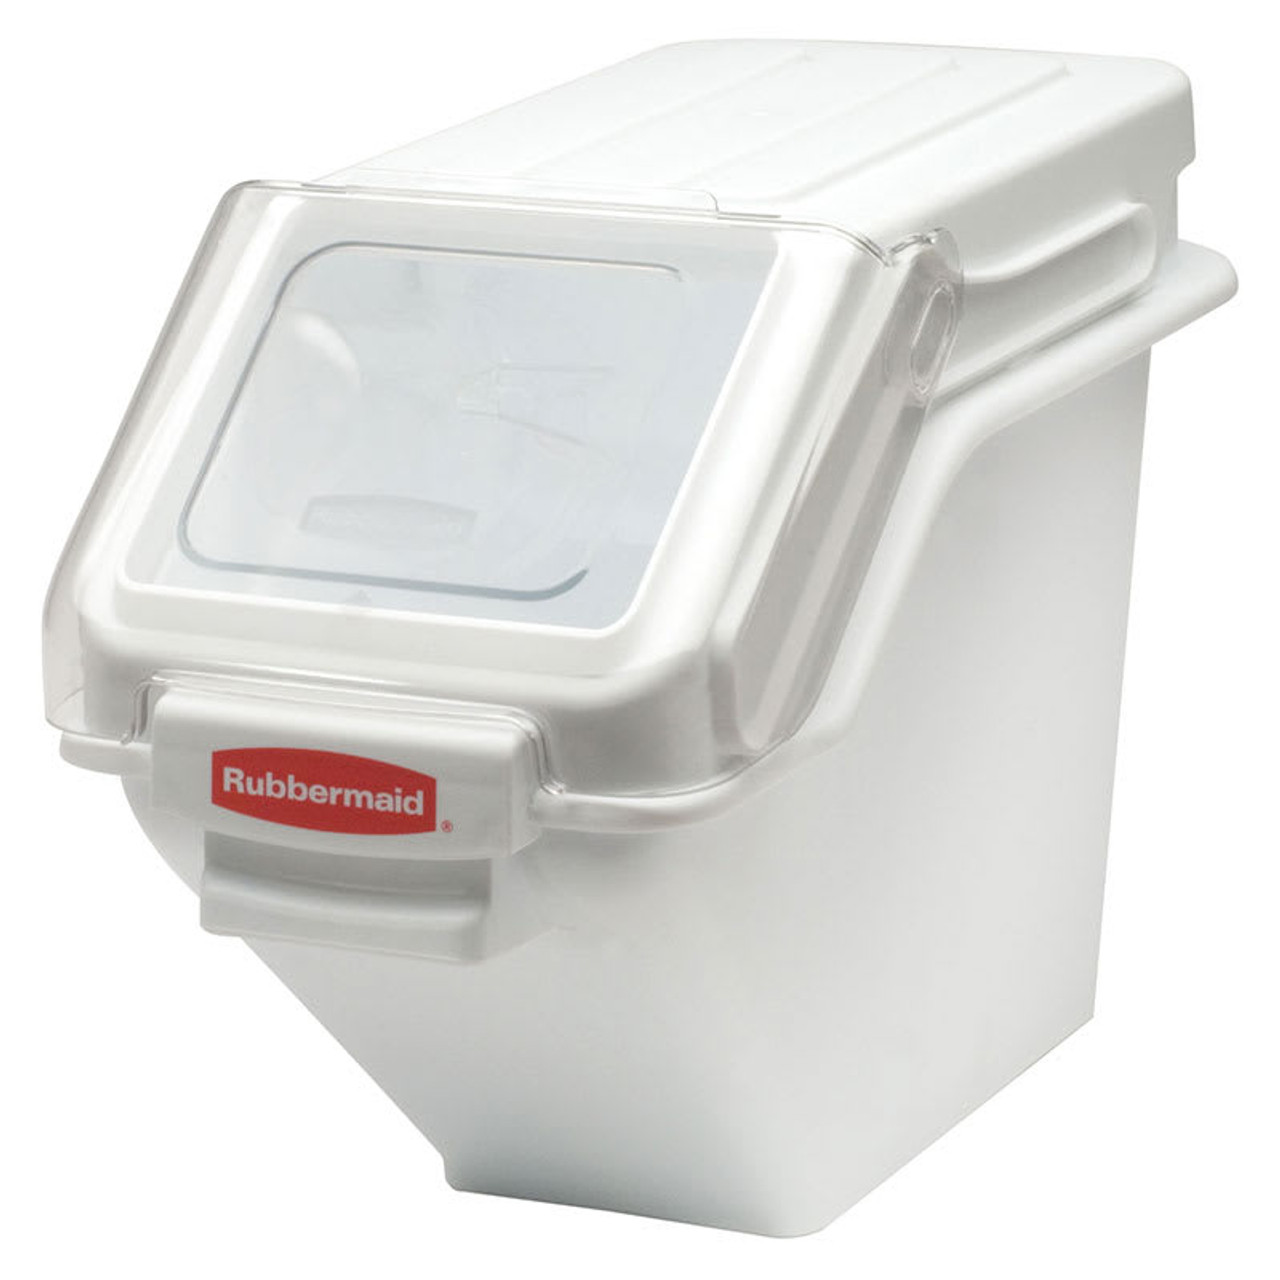 Rubbermaid Safety Storage Bin Midi